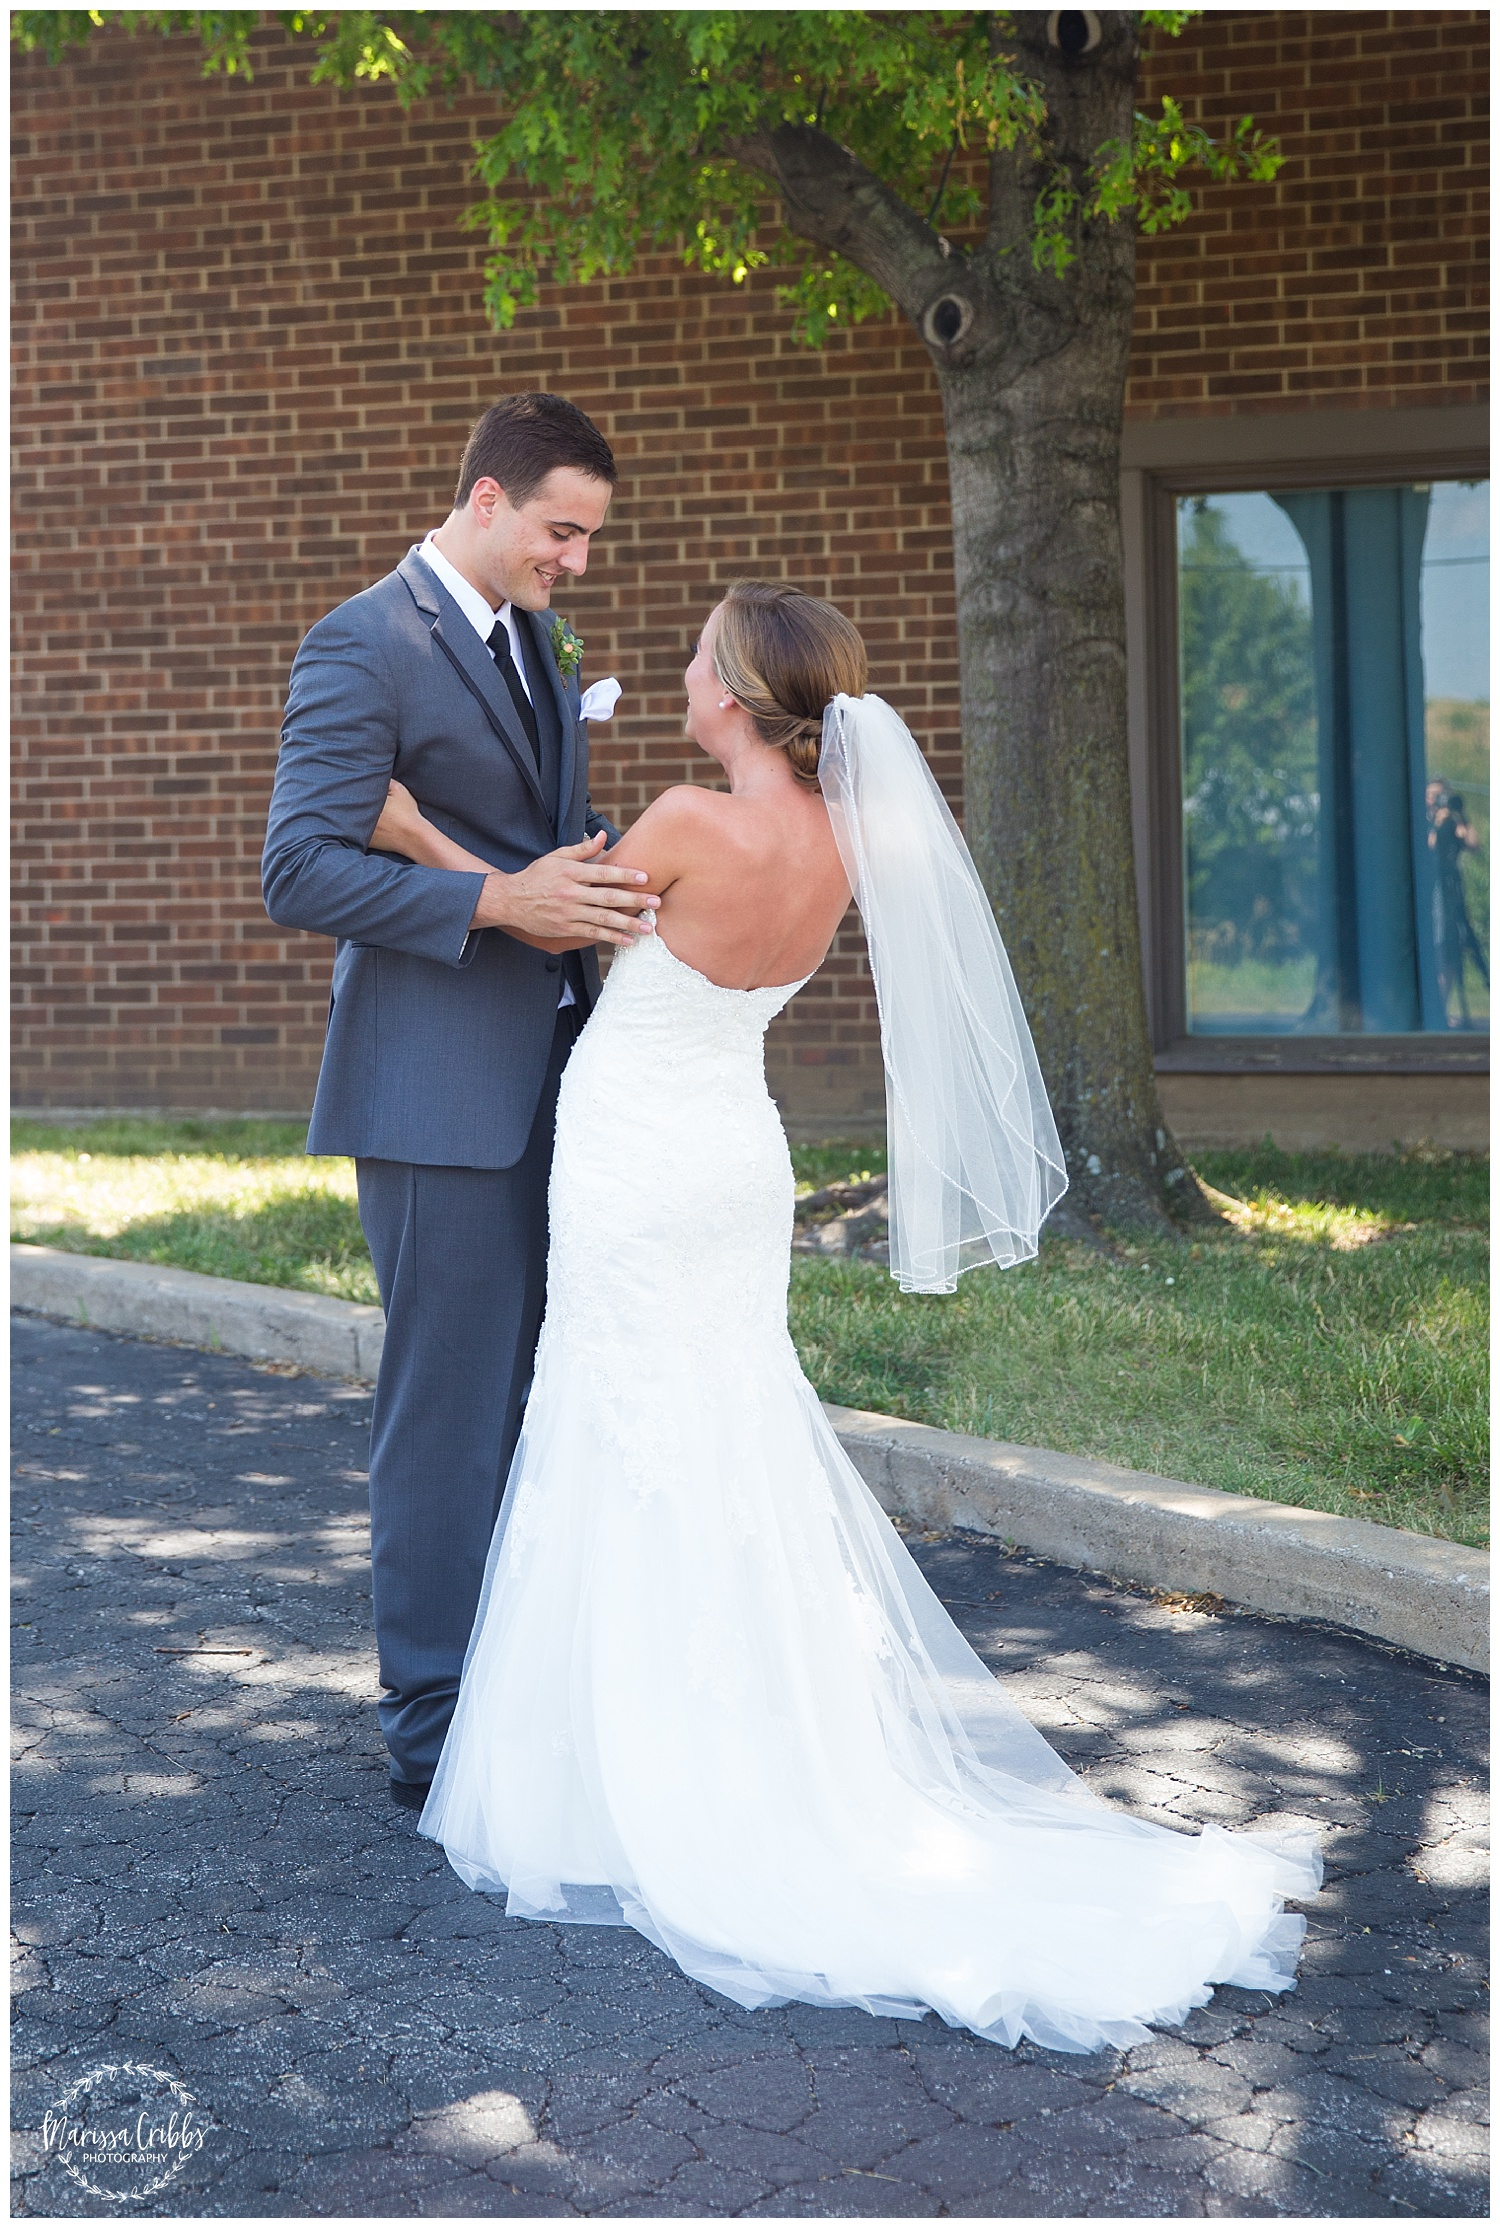 Twin Double Wedding | Union Horse Distilling Co. | Marissa Cribbs Photography | KC Weddings_0054.jpg